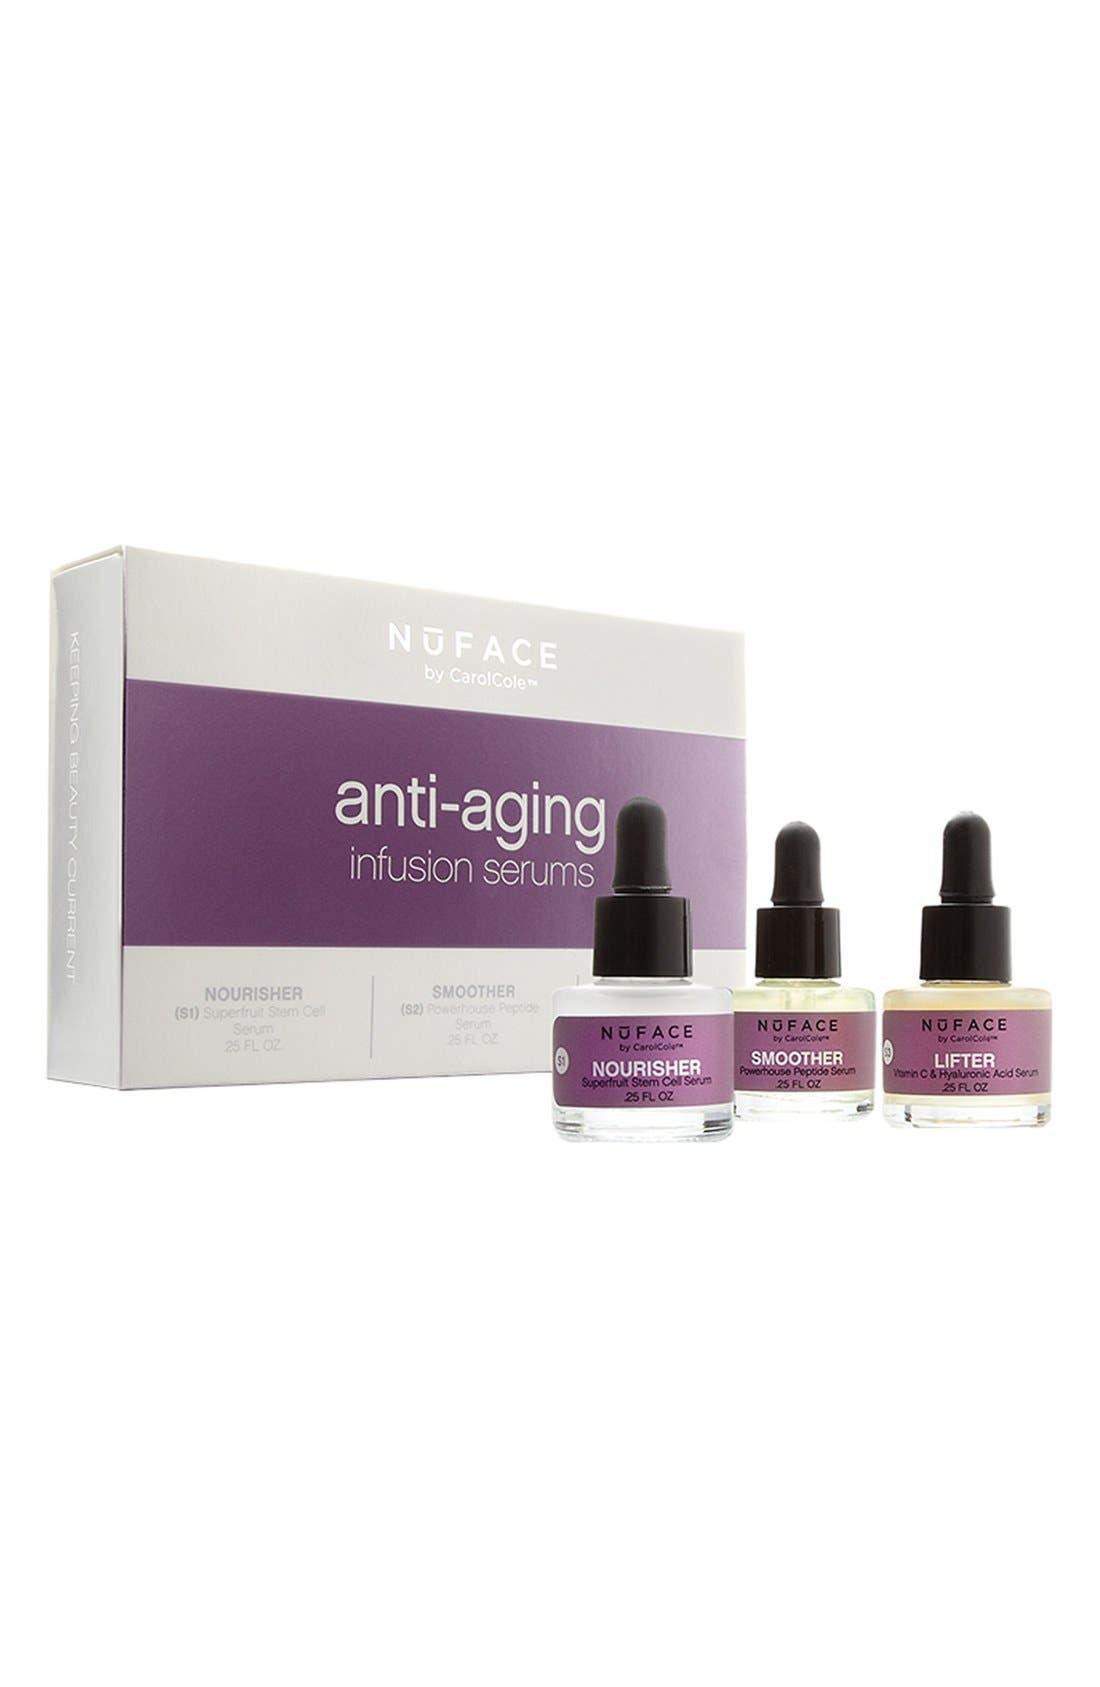 NuFACE® 'Anti Aging Infusion' Serum Trio